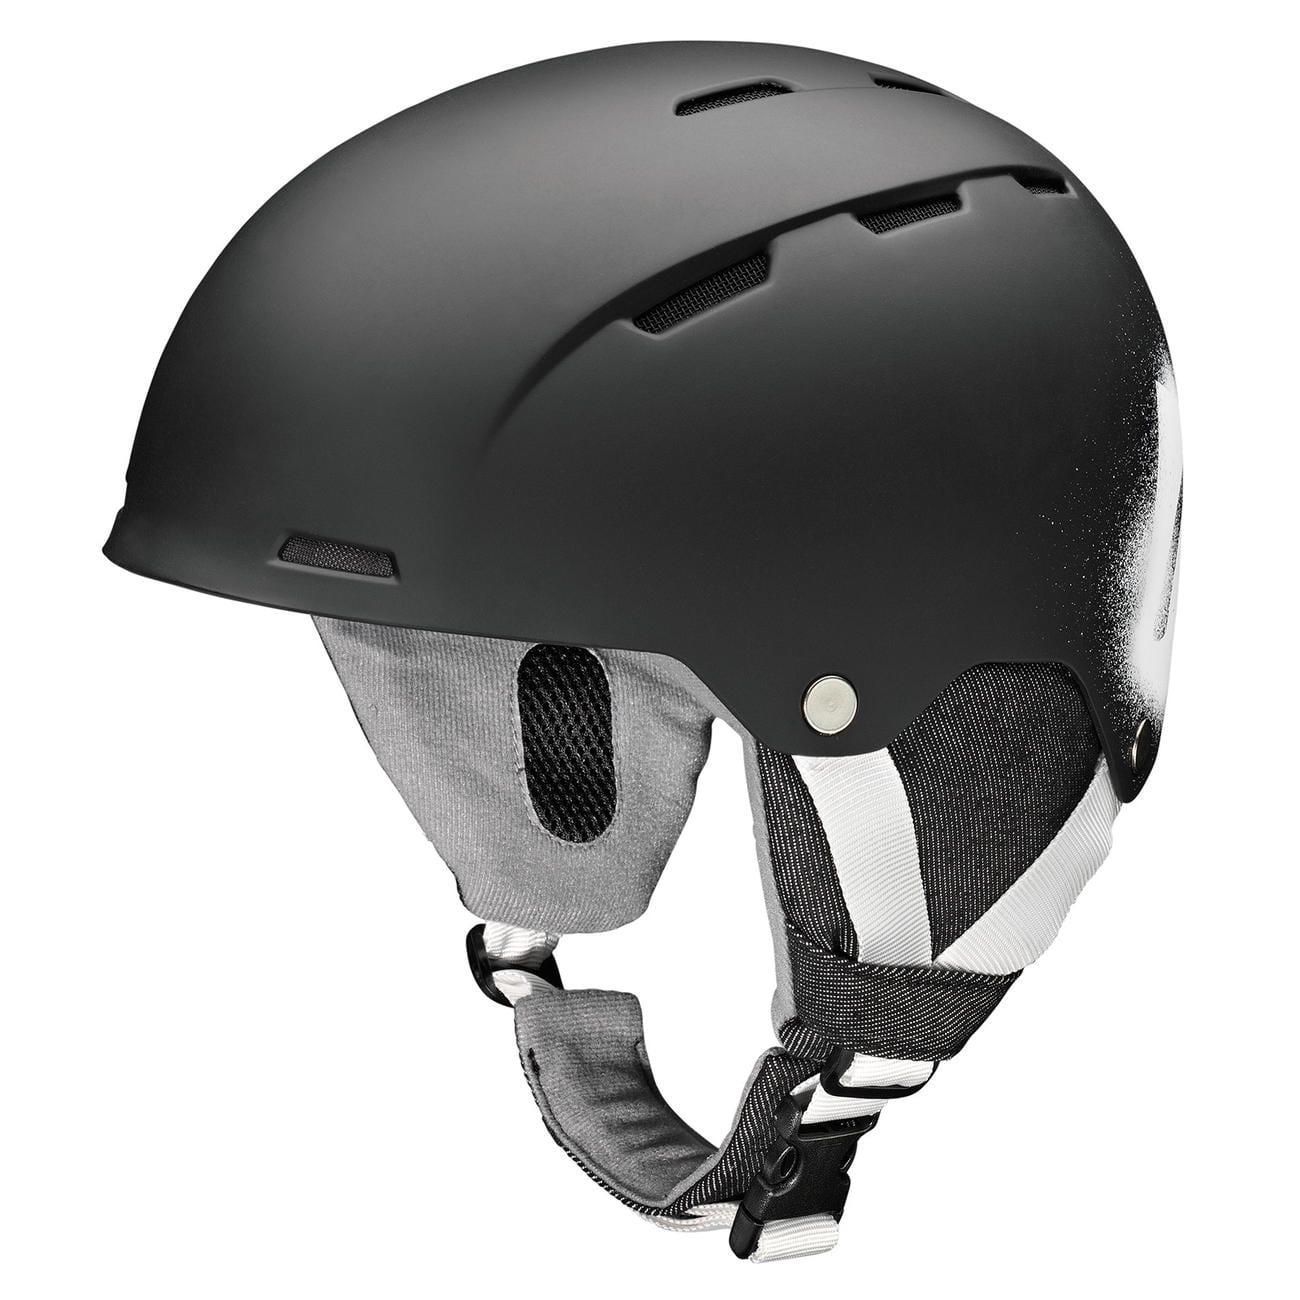 Mens ski gloves xl - Head Arise Ski Helmet